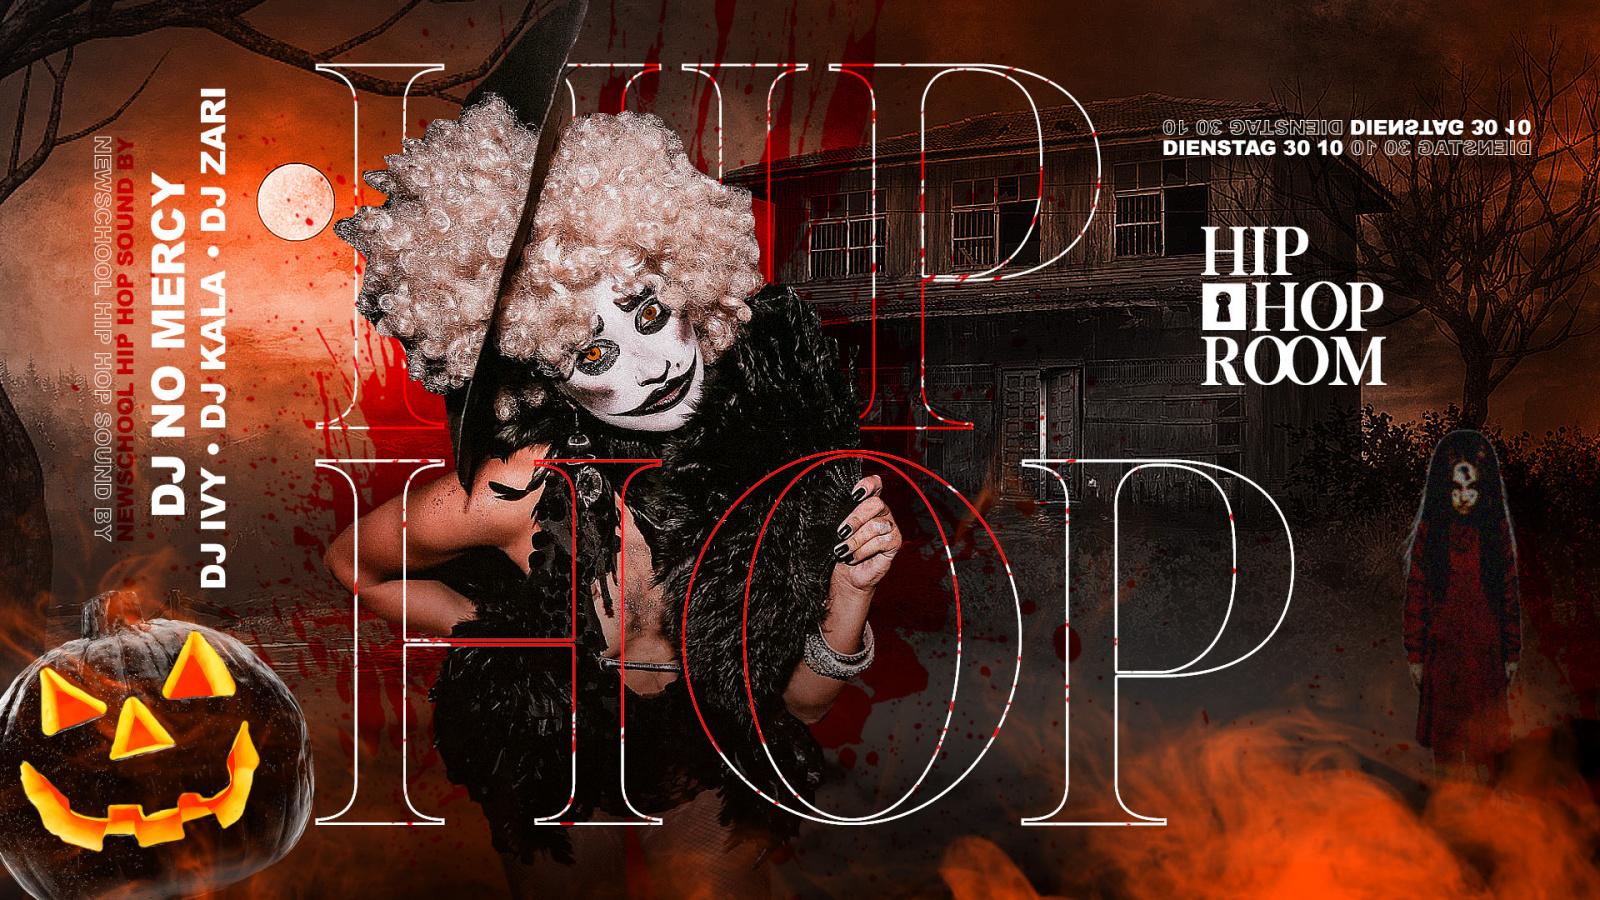 Halloween 30 Oktober.Hip Hop Halloween Dienstag 30 Oktober Dienstag 30 10 2018